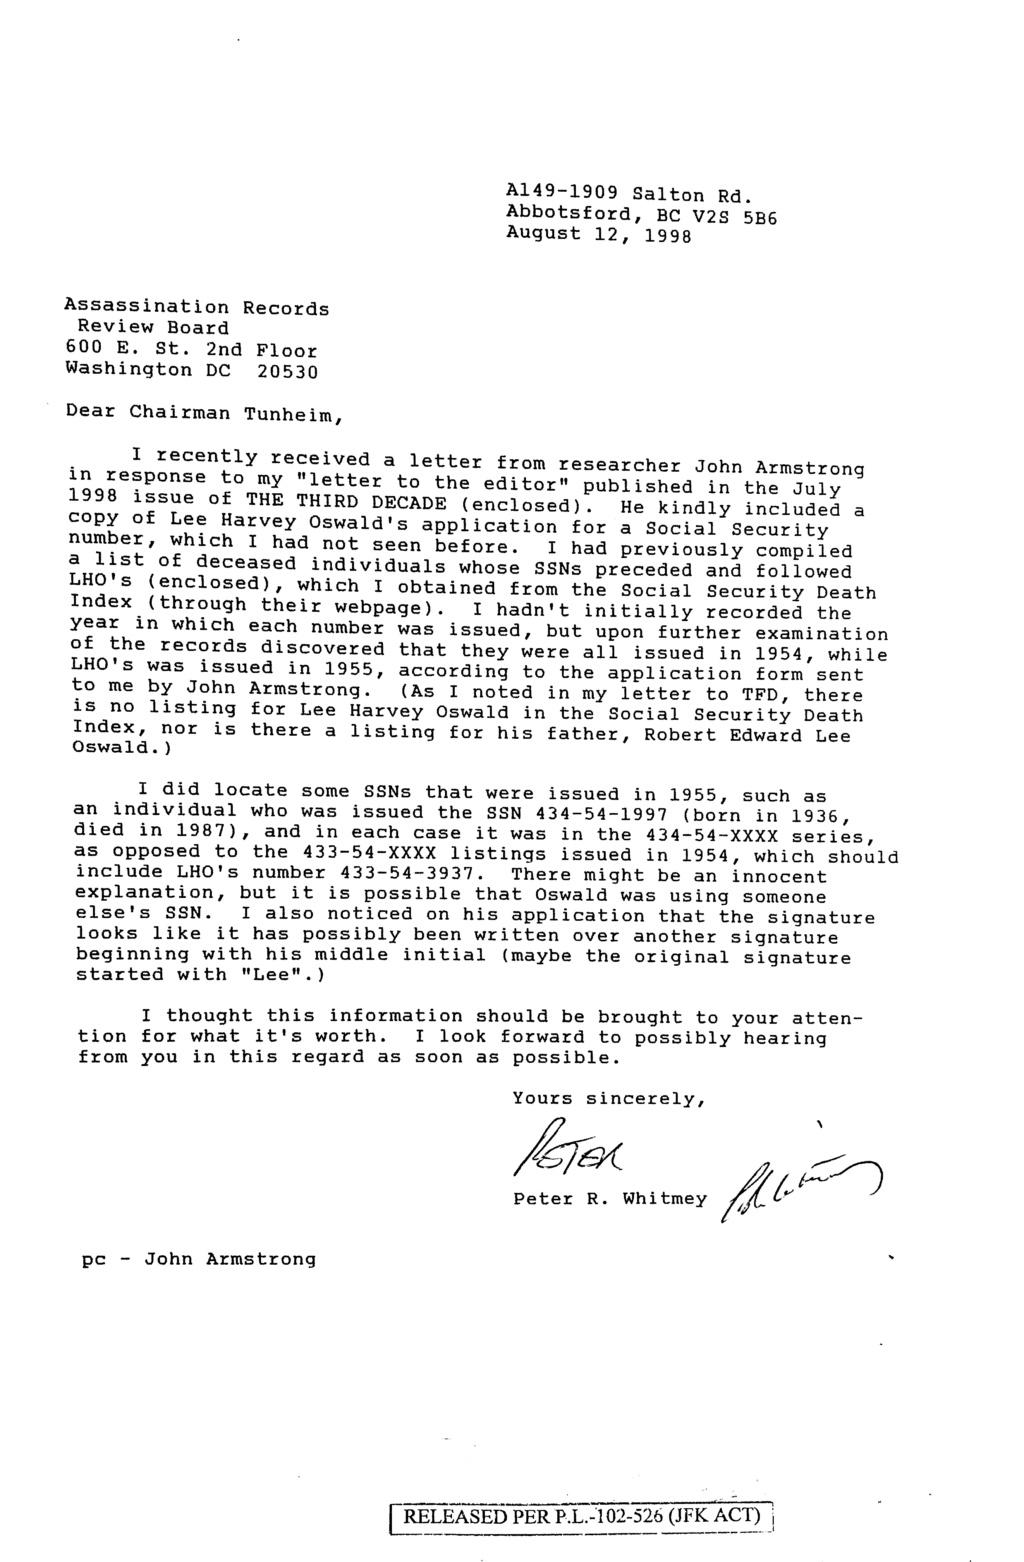 Lee Harvey Oswald Social Security No. Jun_1116